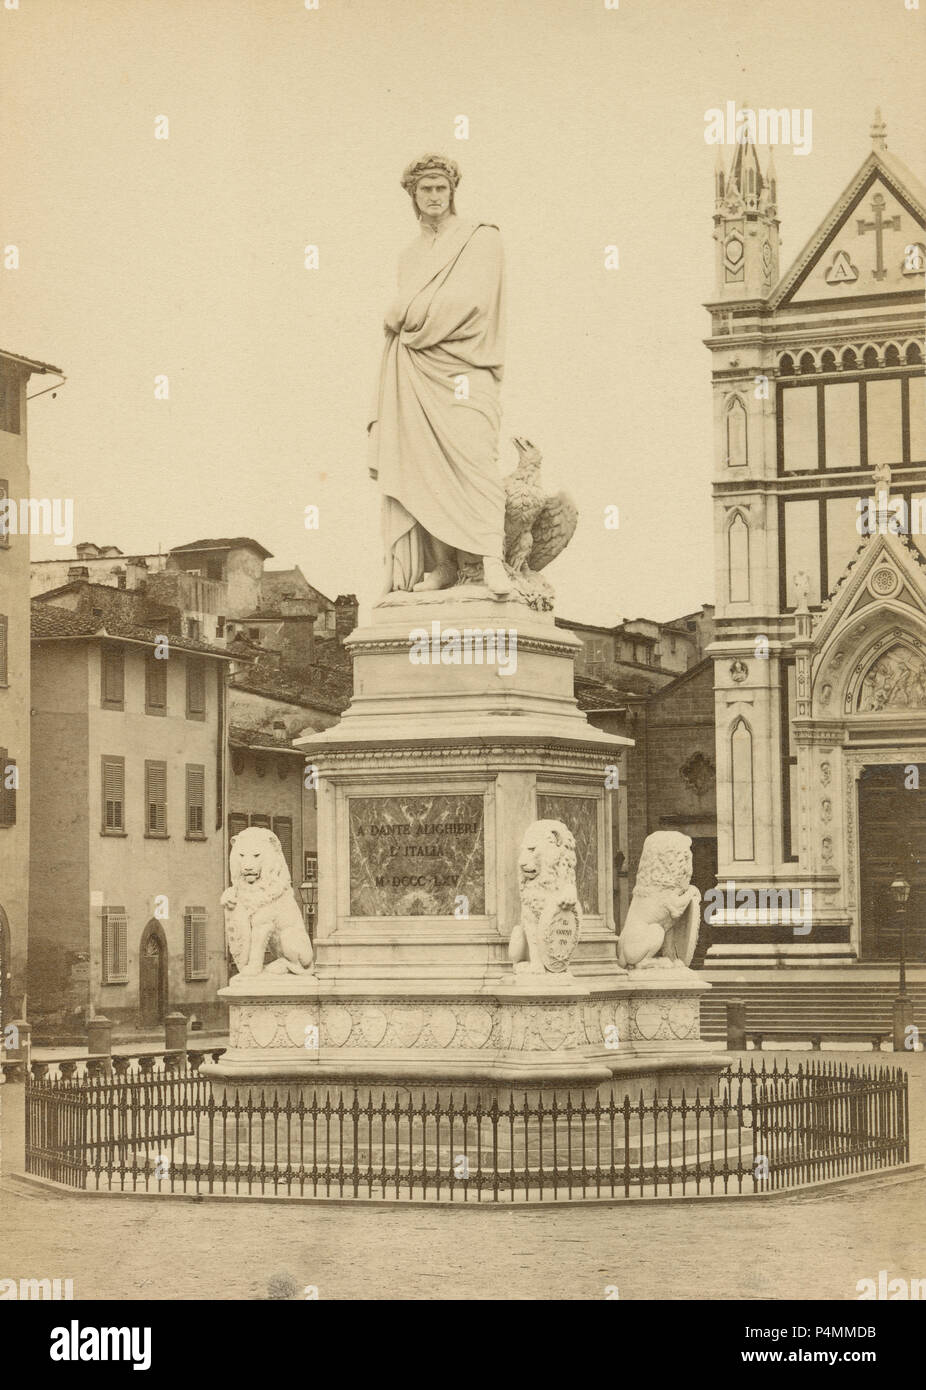 Antique circa 1880 photograph, the statue of Dante Alighieri in Piazza Santa Croce, next to Basilica of Santa Croce, Florence, Italy. It was built in 1865 by Italian sculptor Enrico Pazzi. SOURCE: ORIGINAL PHOTOGRAPH - Stock Image